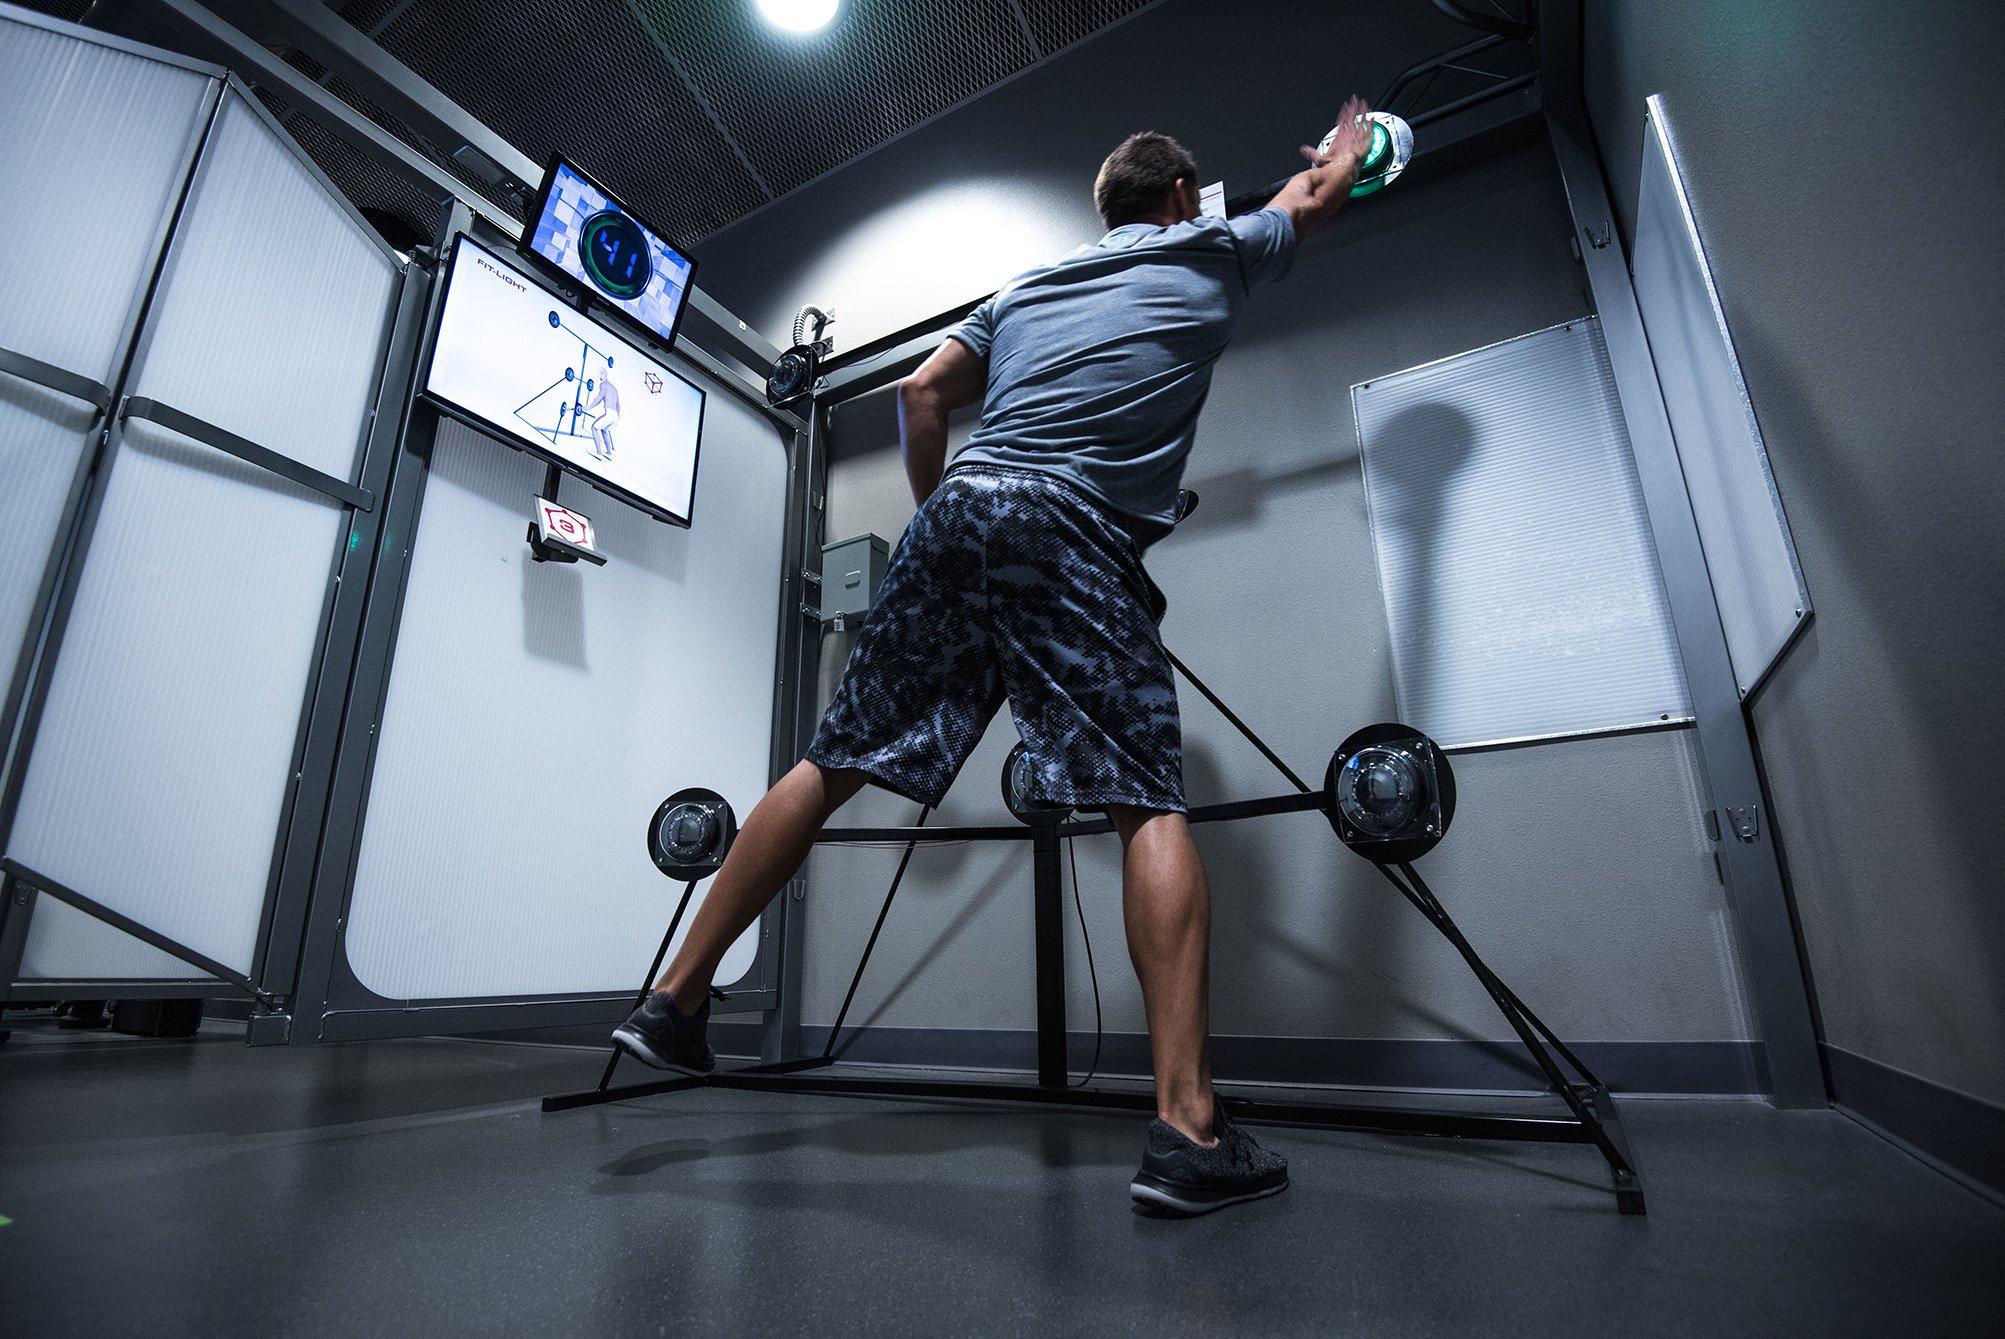 Kubex Fitness Kube With Light React Coordination Exercise.